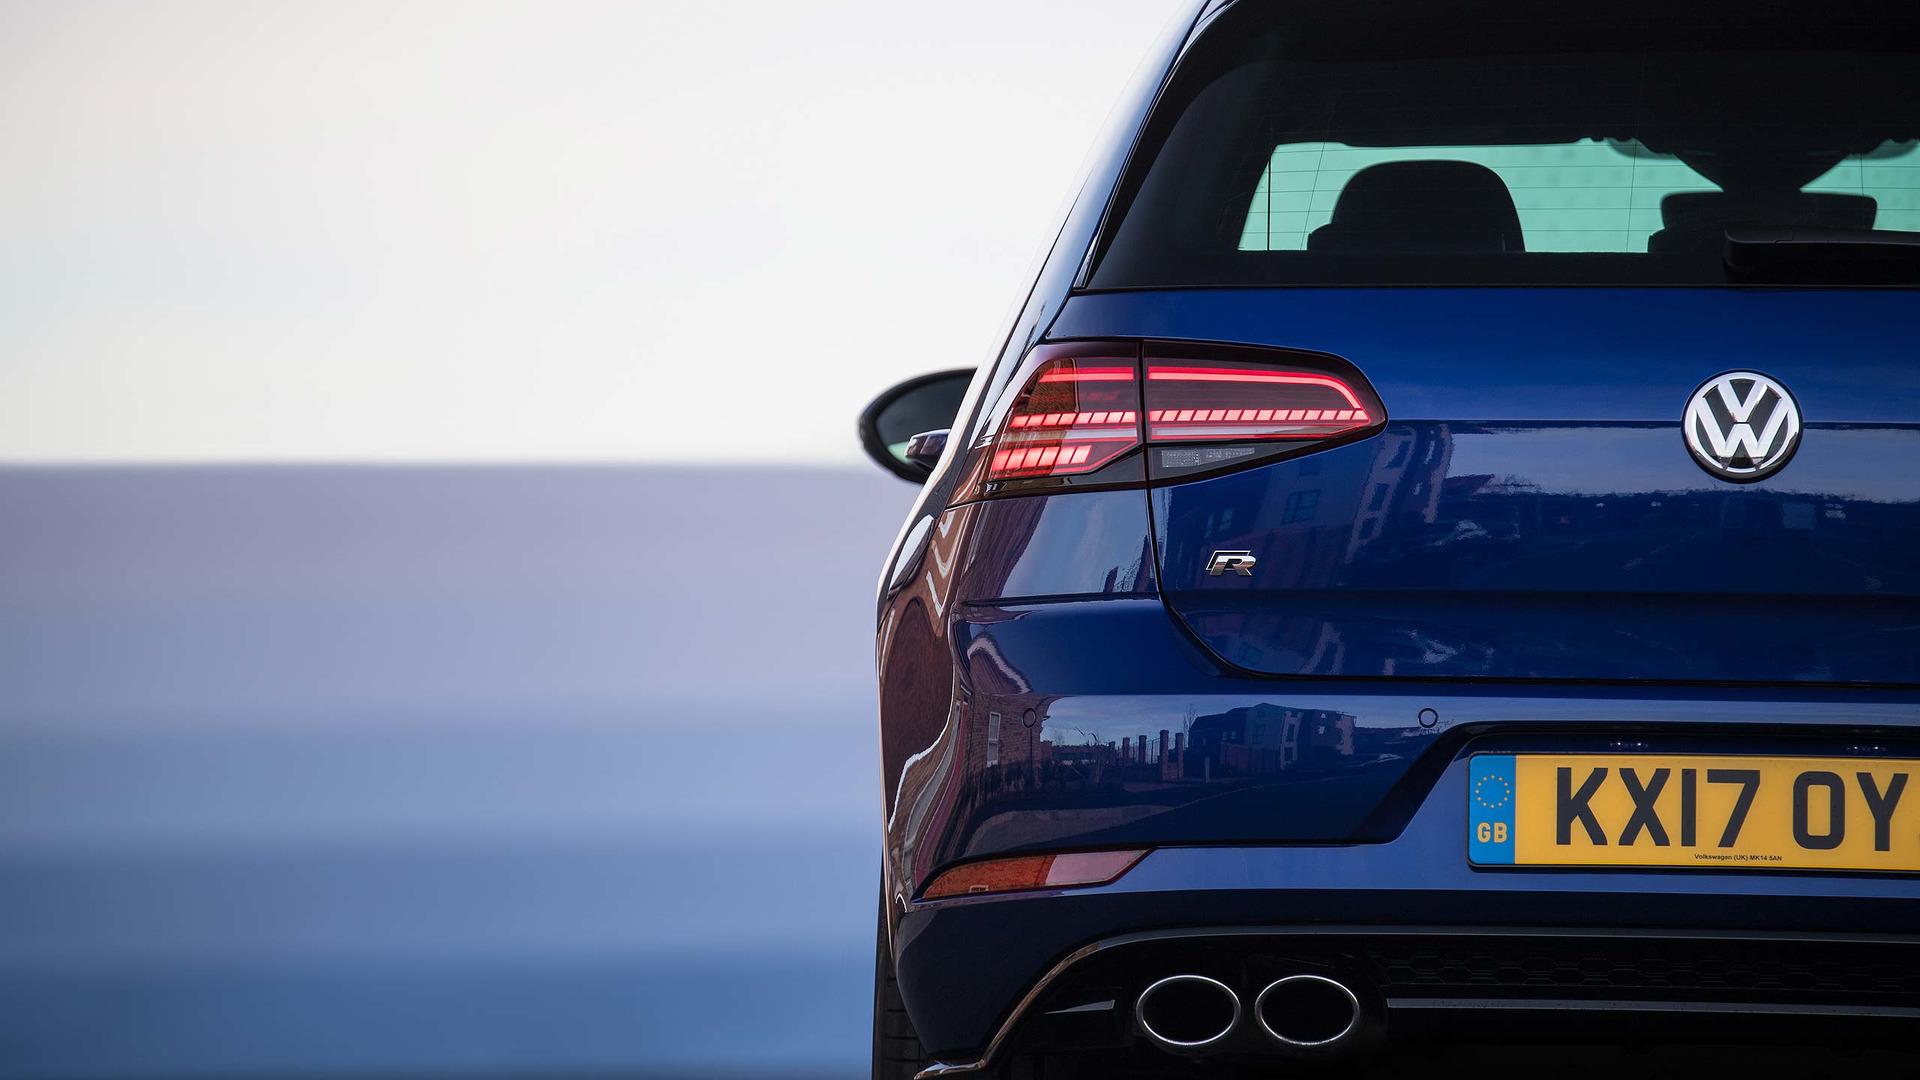 2017 Volkswagen Golf Gti Gtd R Motor1 Com Photos